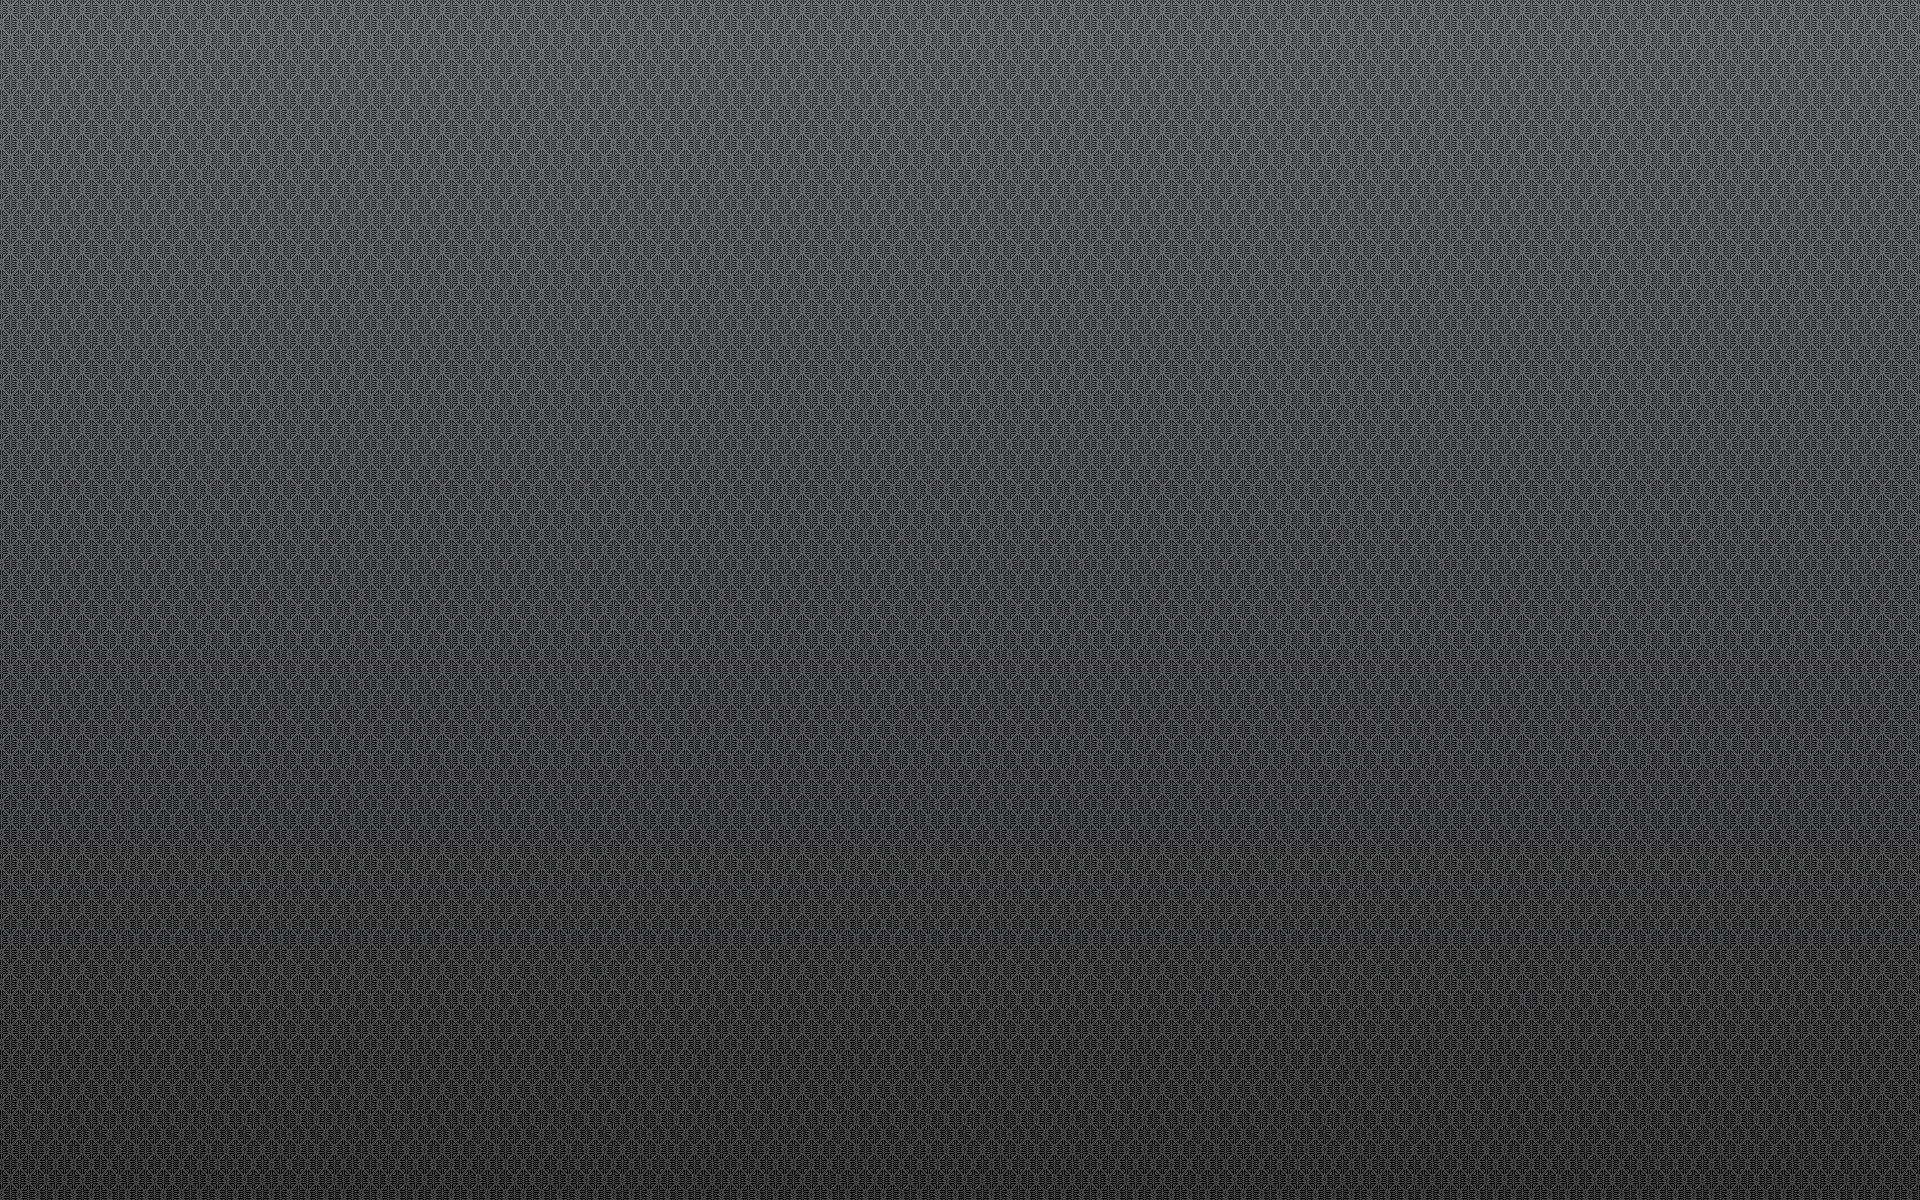 Grey Wallpaper Hd: Grey HD Wallpapers